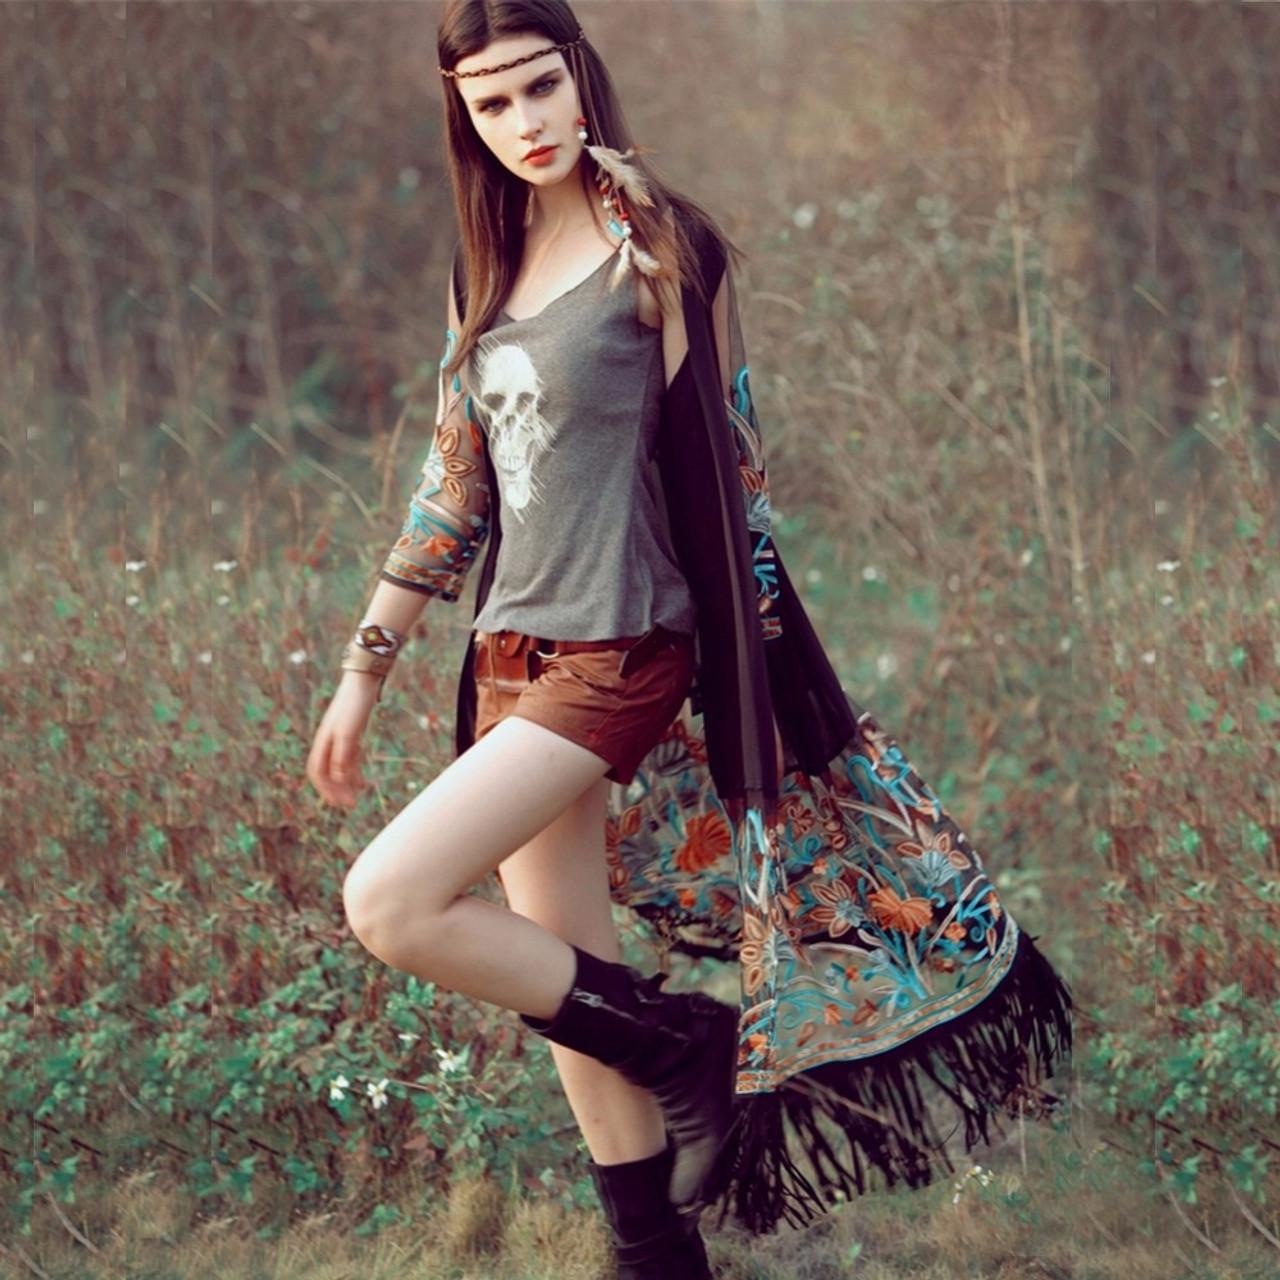 248f1ba5661 ... Bamskarosa Bohemian Style 2018 Summer Kimono Cardigan Casual Fashion  Boho Hippie Embroidery Tassel Ladies Shirts Women ...